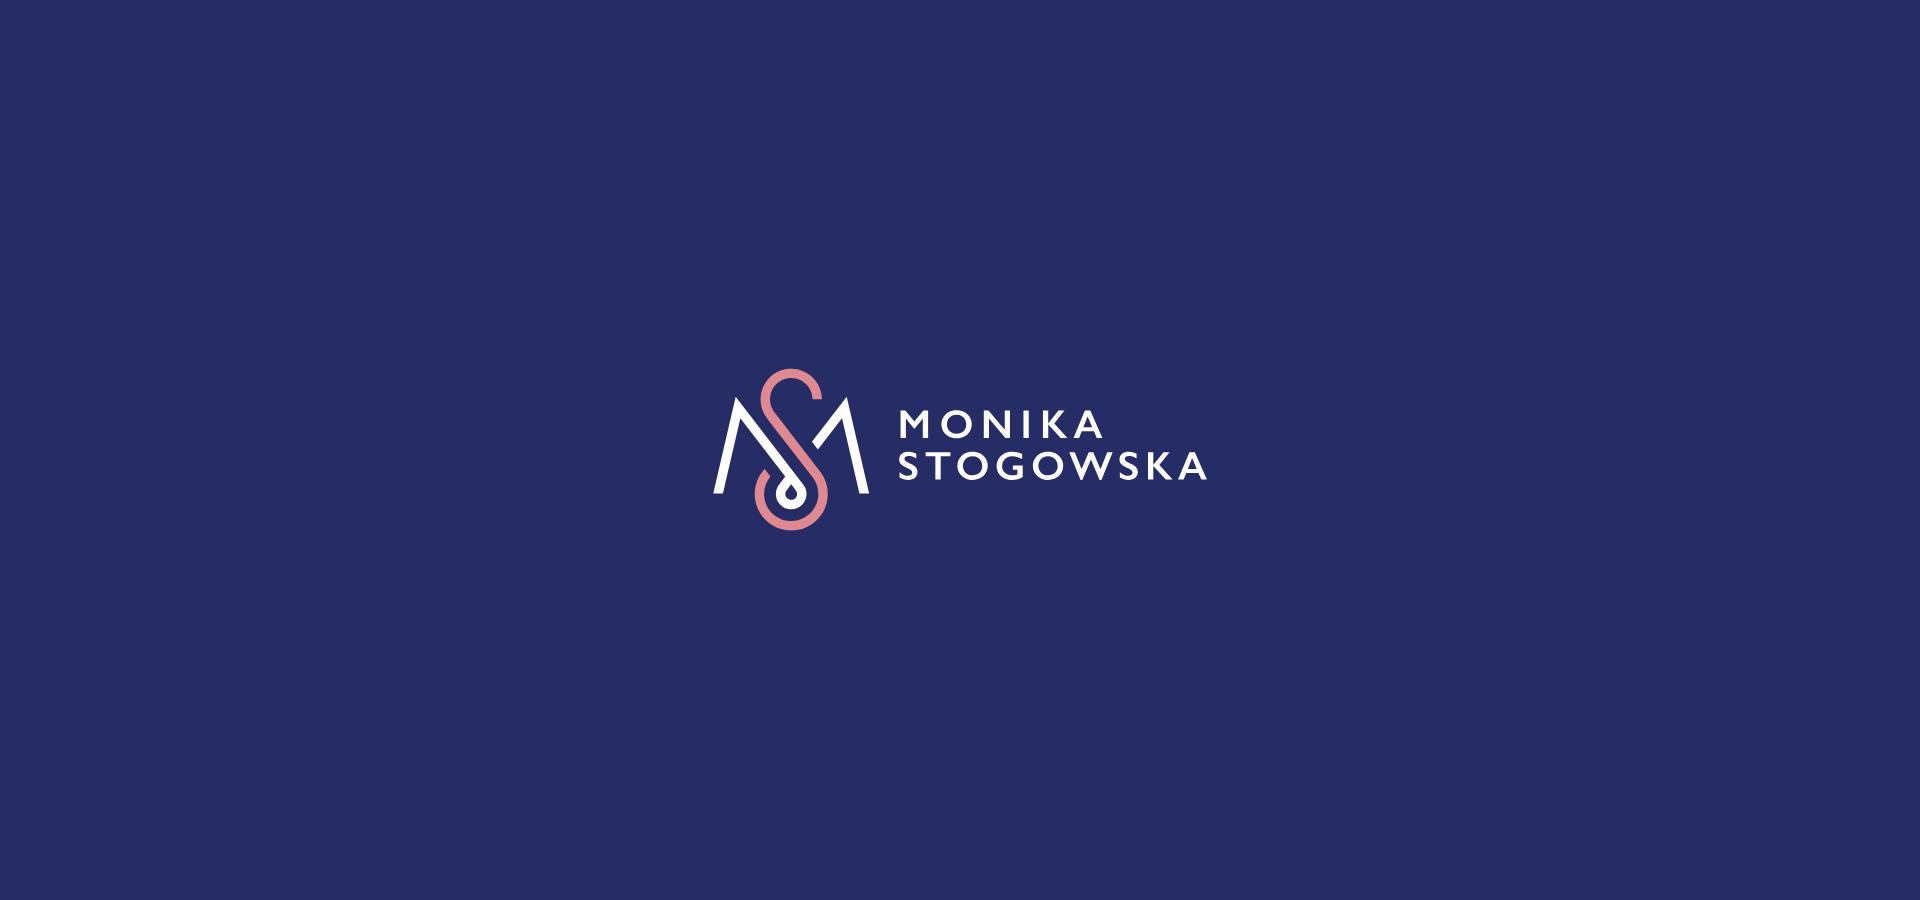 Dominik-Pacholczyk-Logo-Design-Collection-16